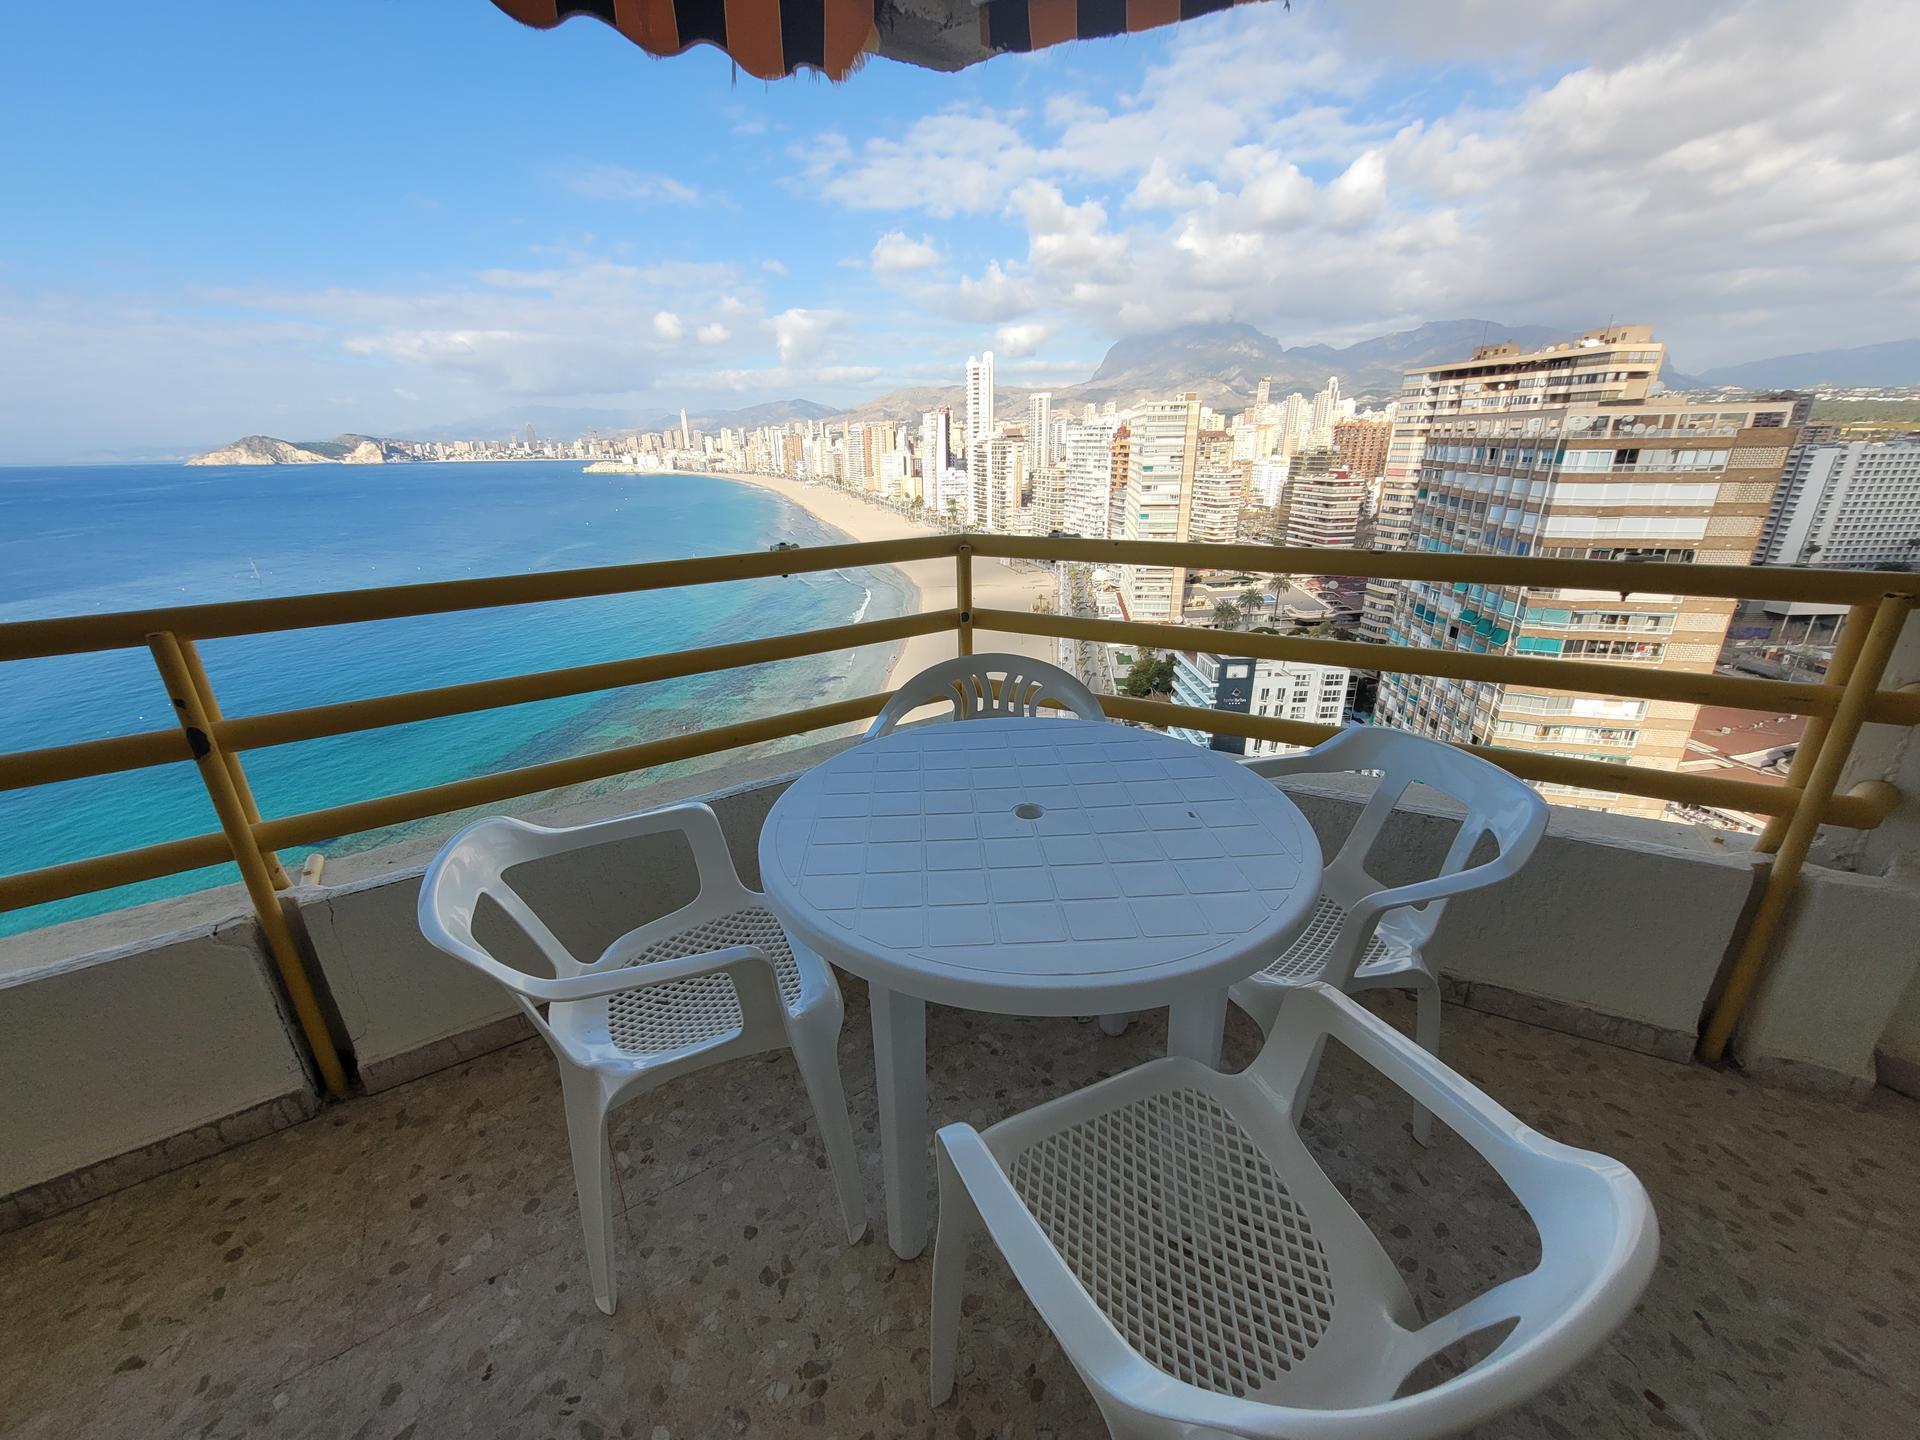 Apartamento -                                       Benidorm -                                       2 dormitorios -                                       6 ocupantes